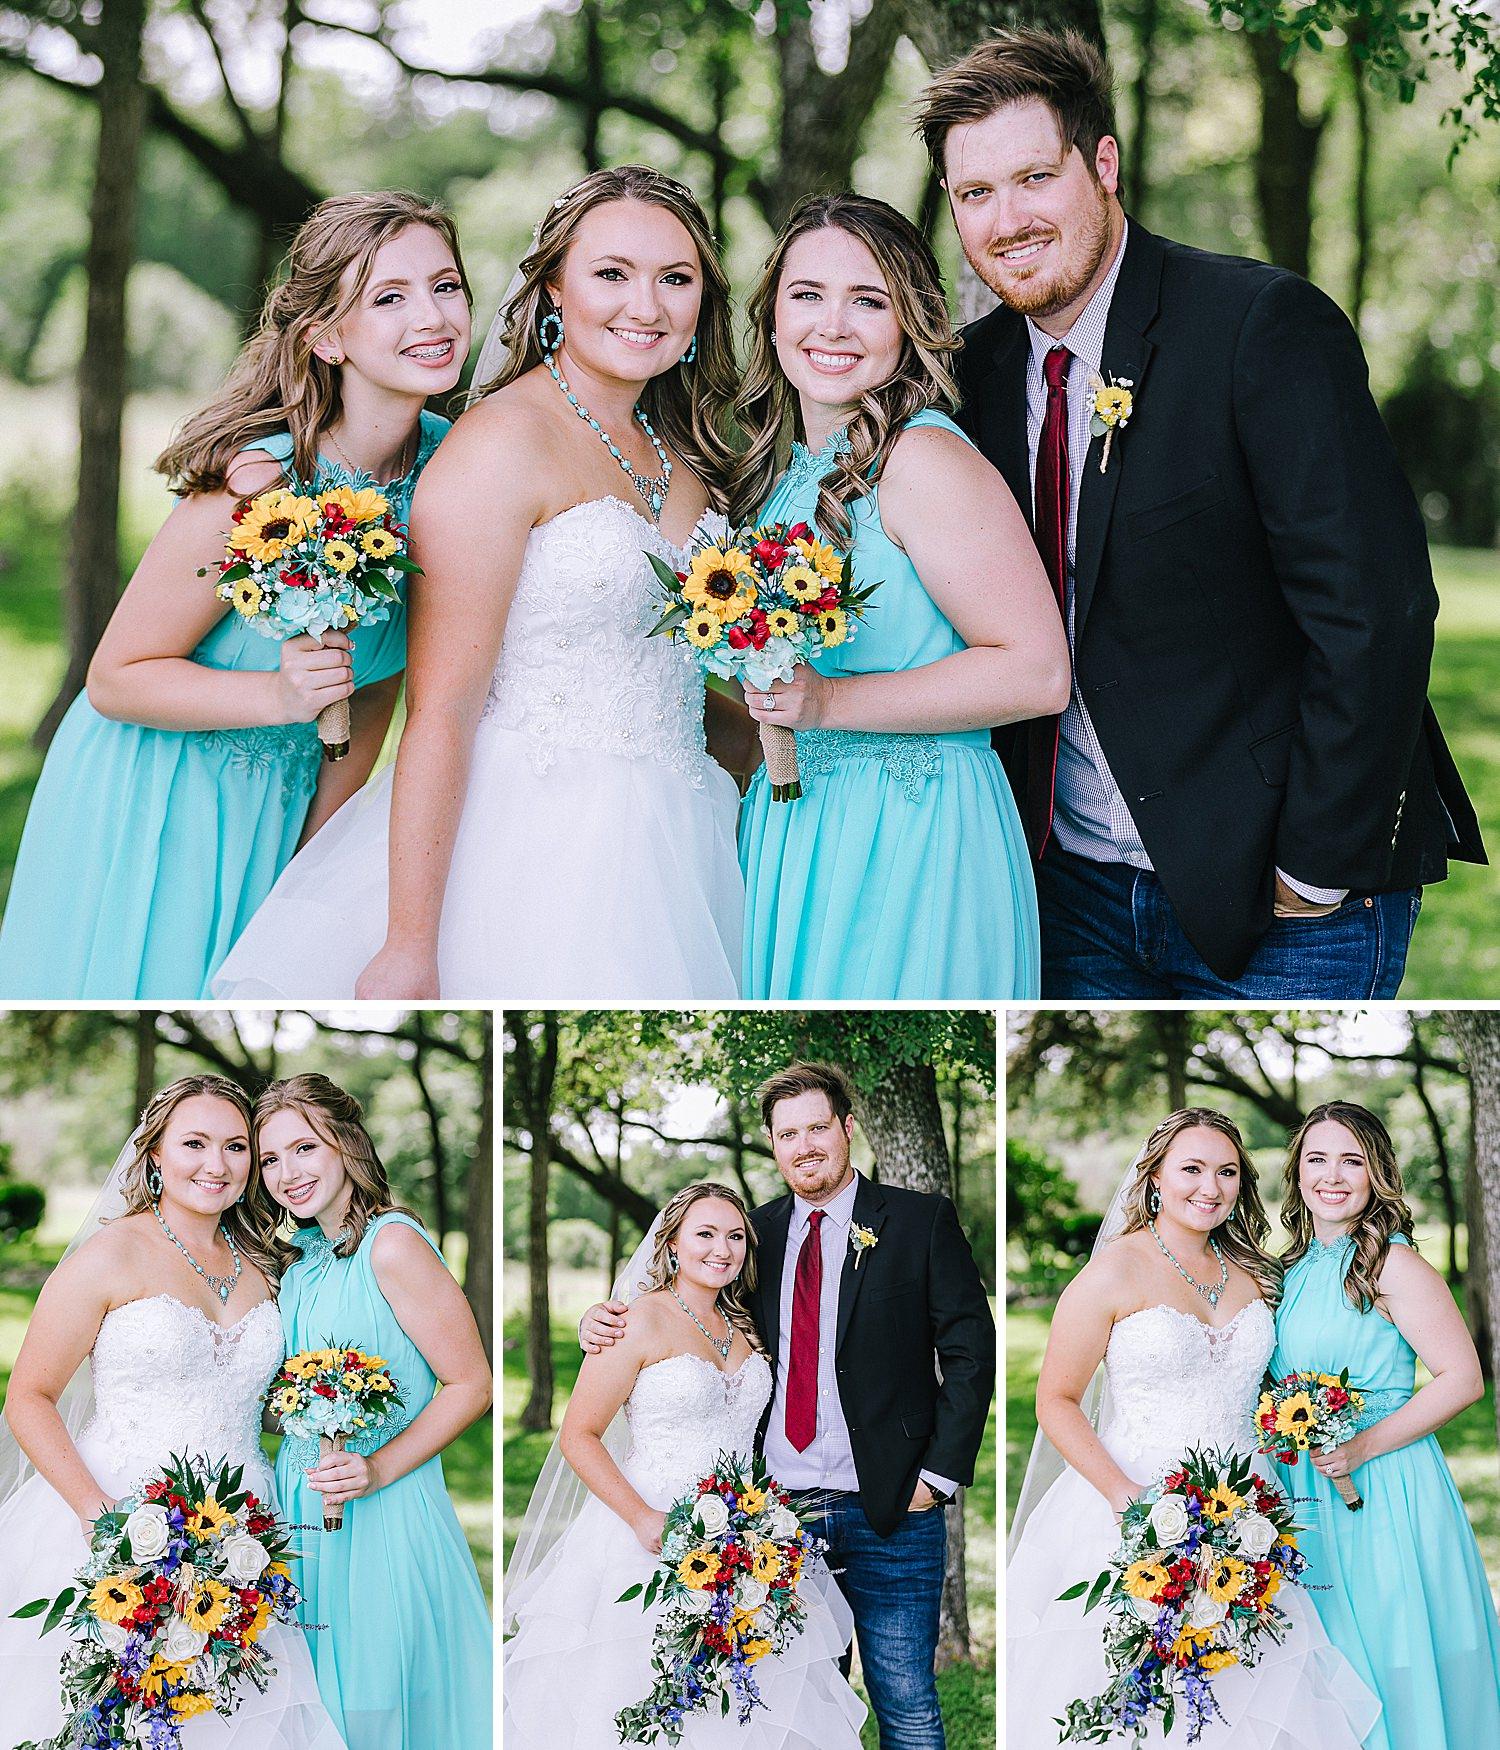 Carly-Barton-Photography-Old-Town-Texas-Rustic-Wedding-Photos-Sunflowers-Boots-Kyle-Texas_0055.jpg